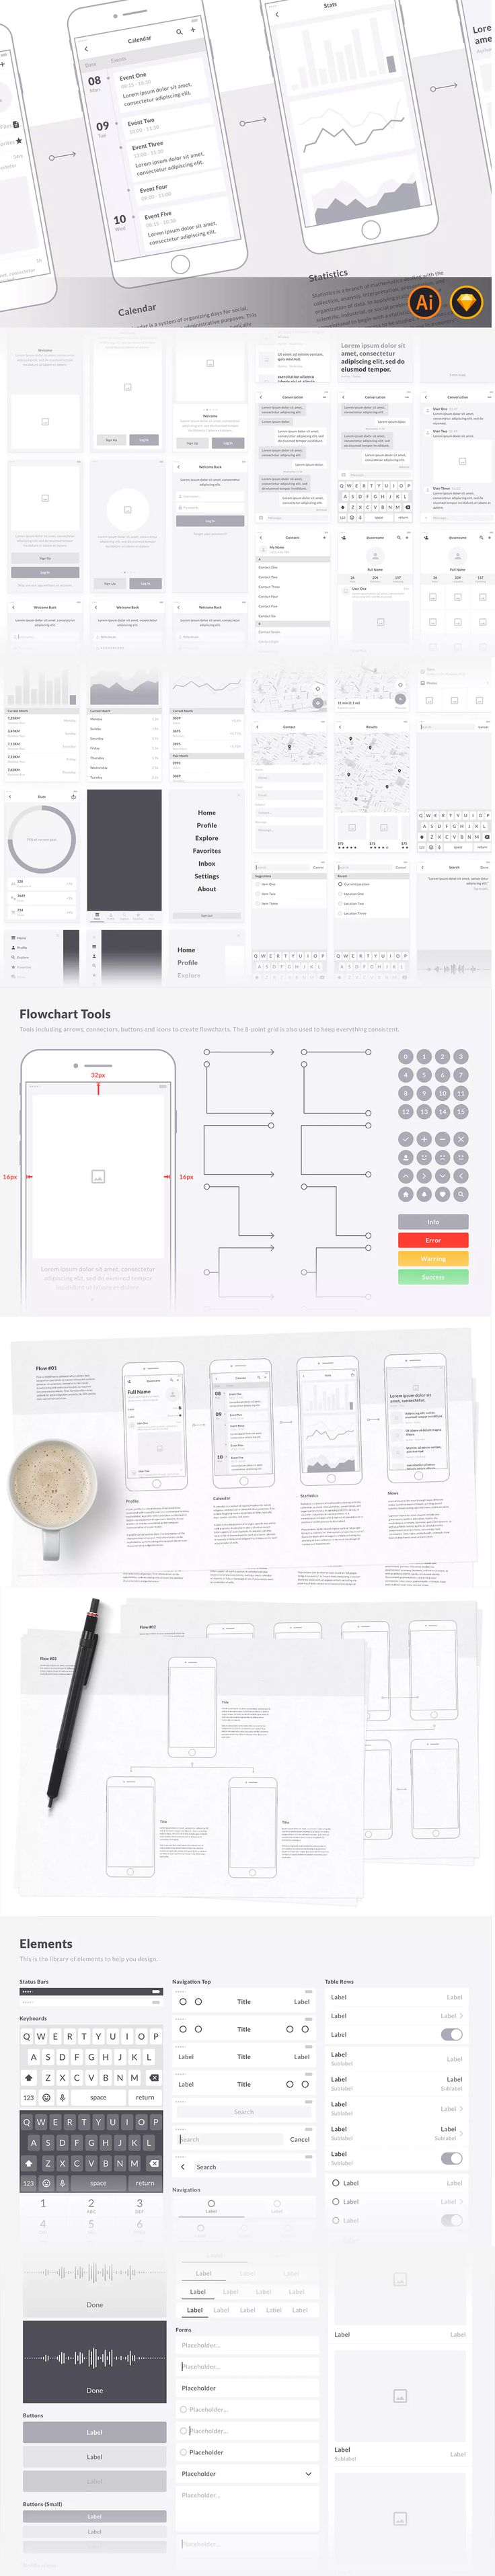 Mobile Wireframe Kit AI